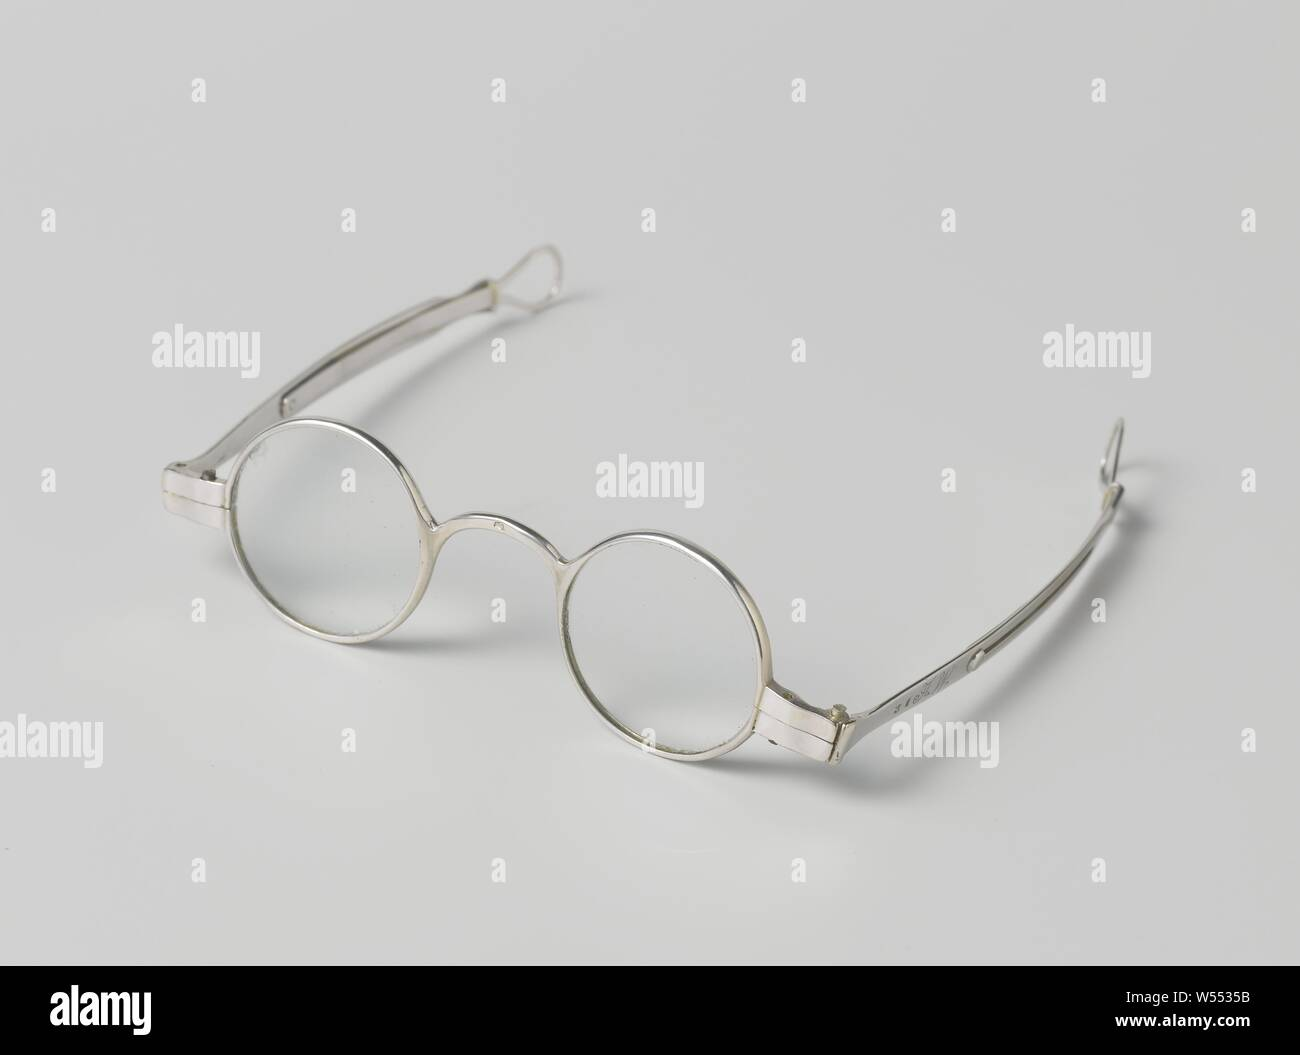 Letter D Initial Black and White Magnetic Metal Eyeglass Badge Holder